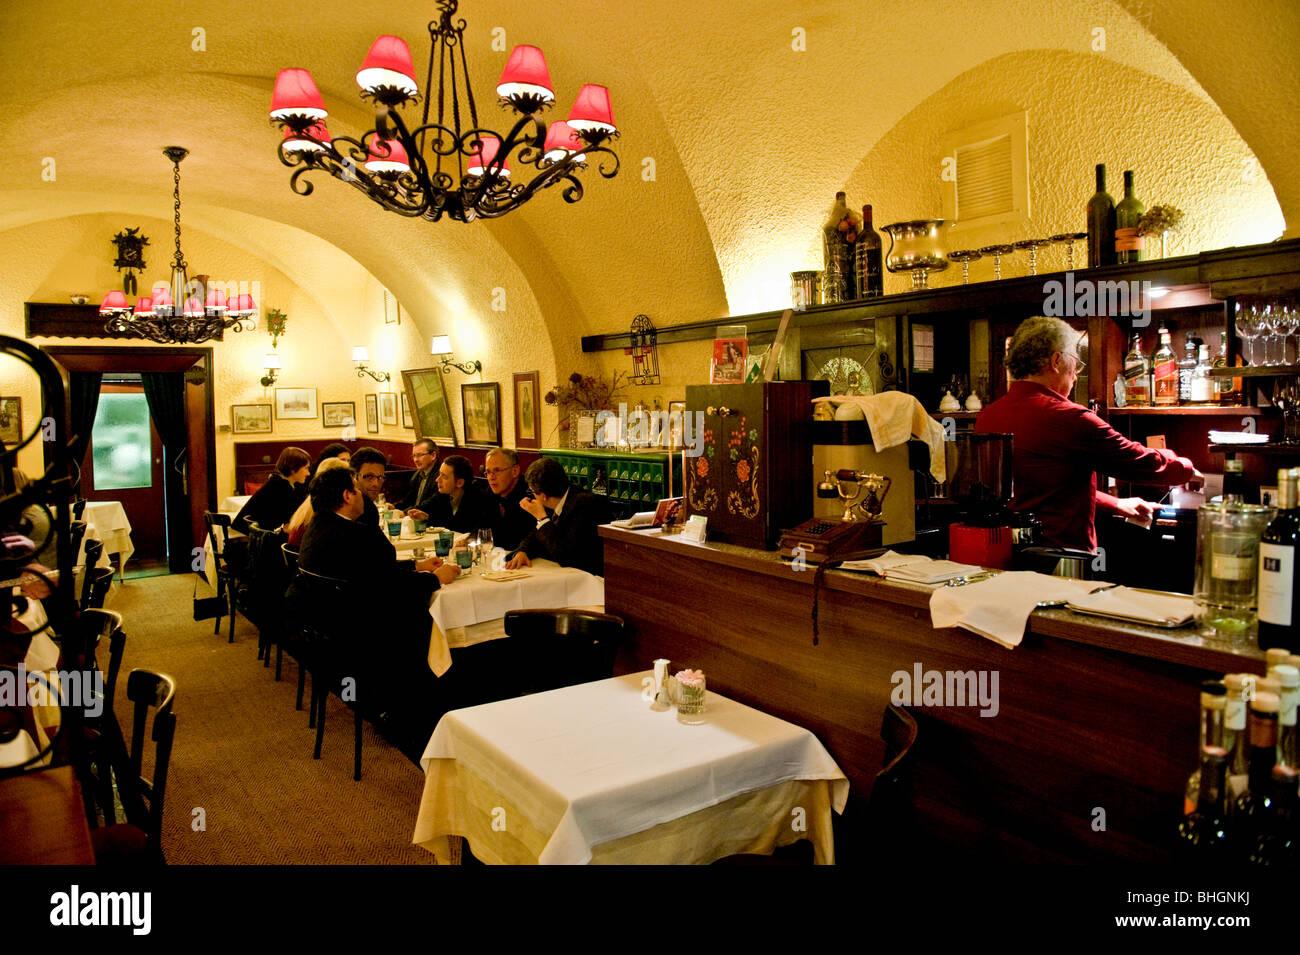 Interior from the Kuckuck restaurant in central Vienna Austria - Stock Image